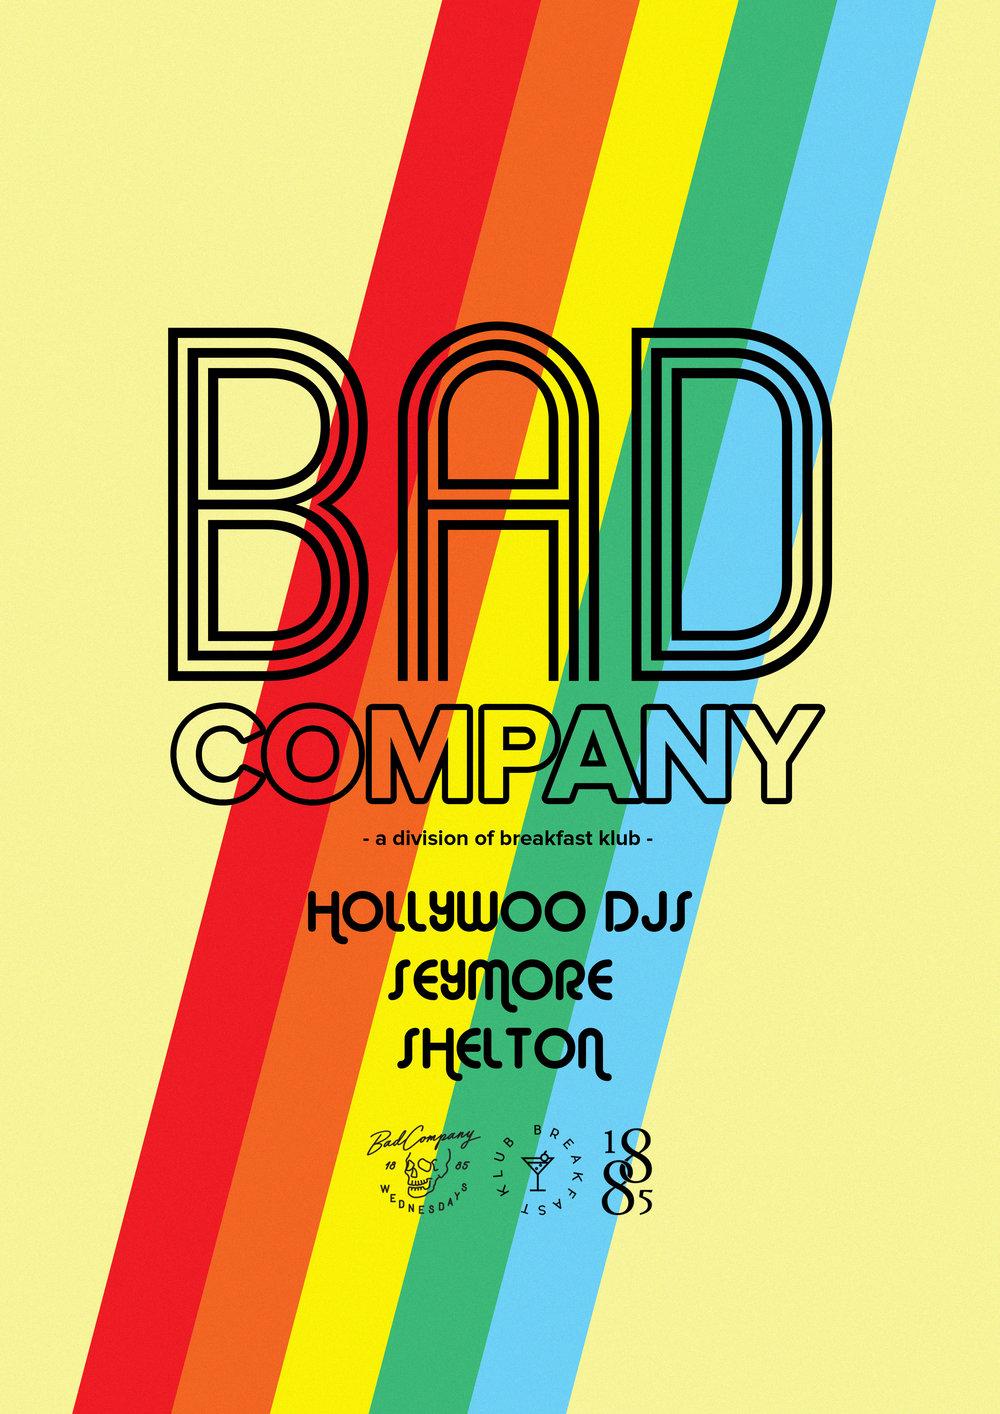 bad company poster sep 6th.jpg